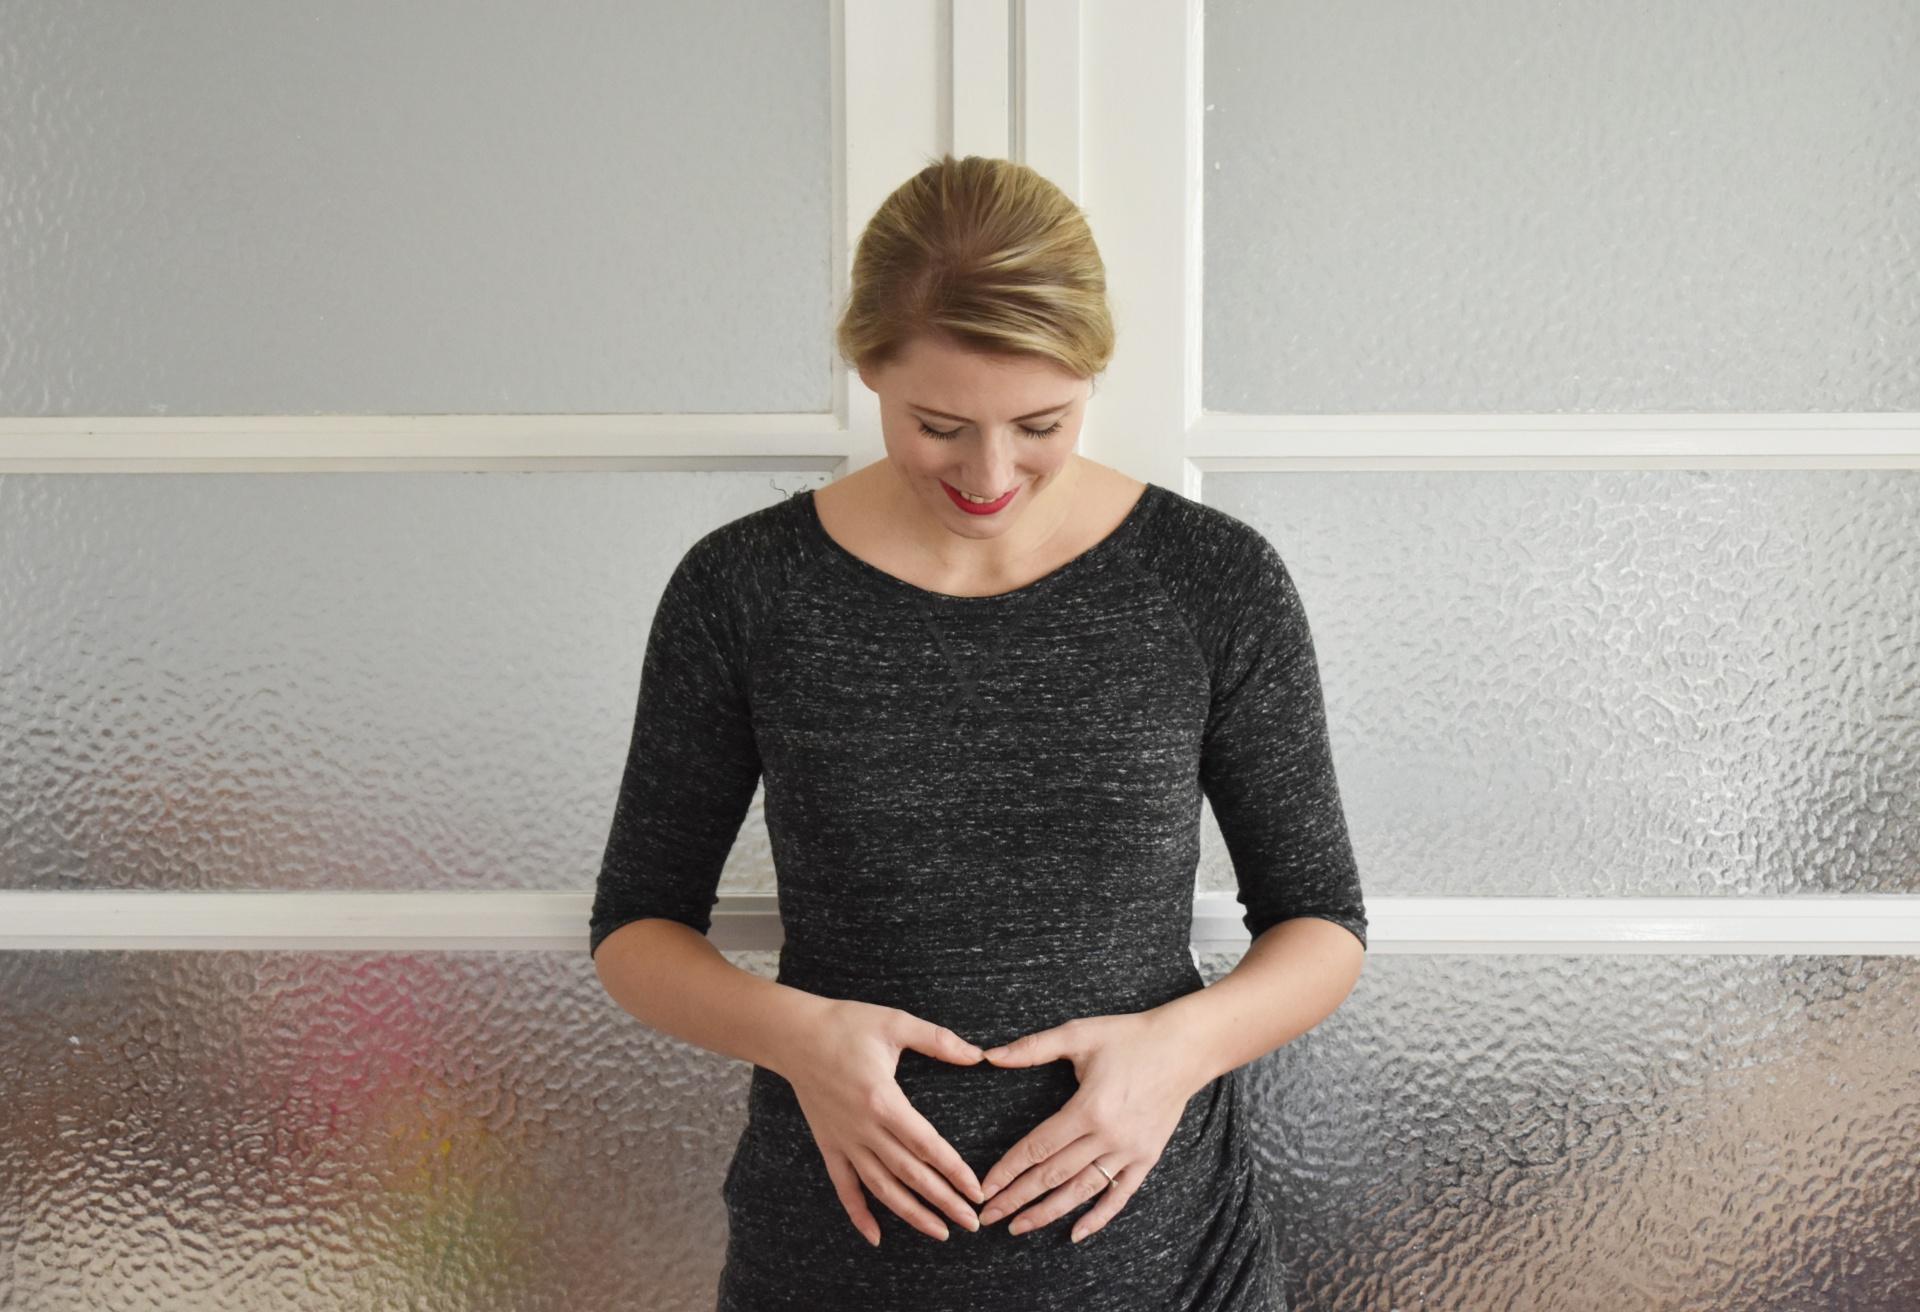 Schwangerschaft Hebamme Vorsorge